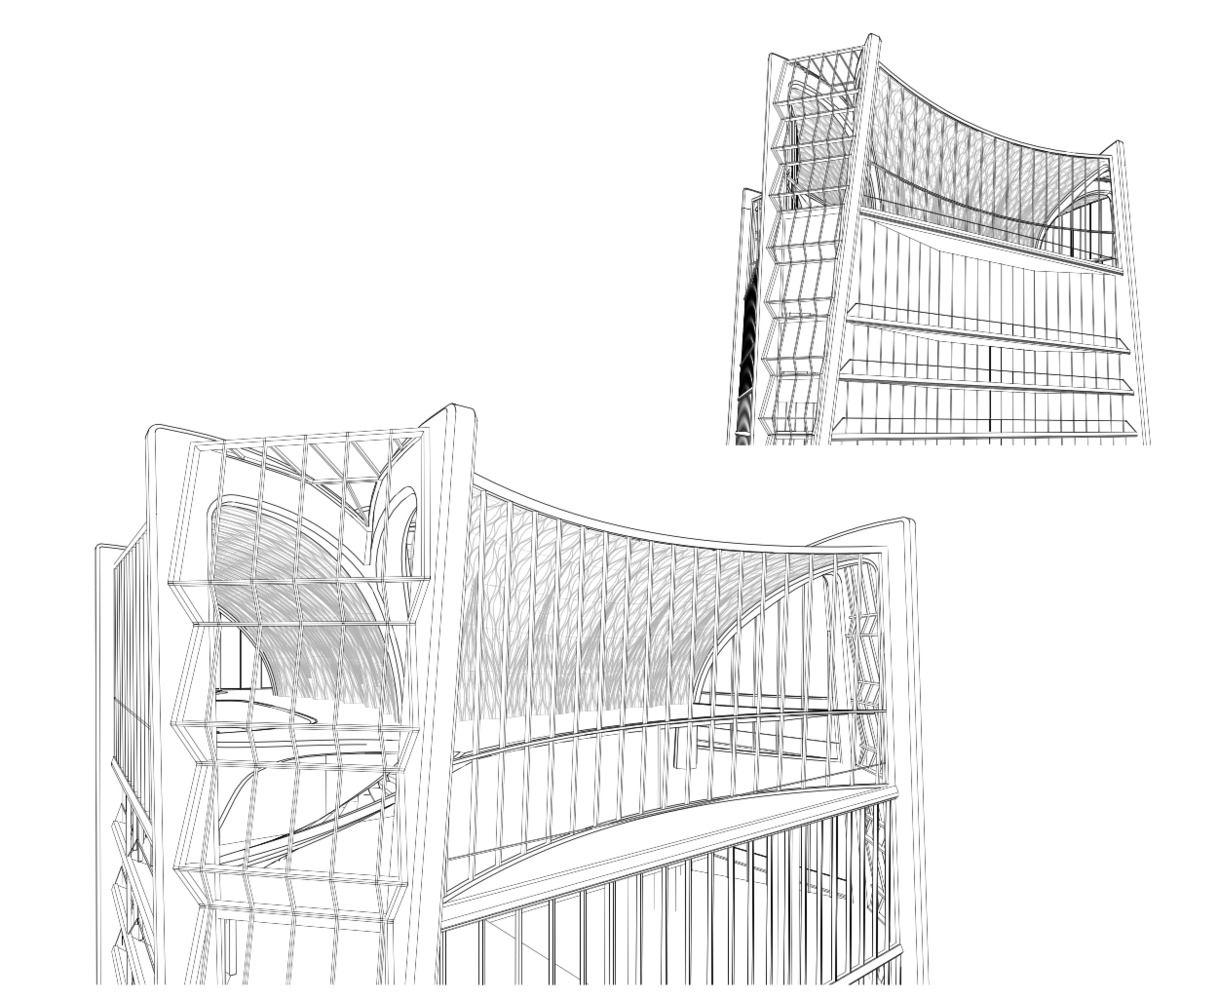 Galeria De Zaha Hadid Presenta Planimetria Estructural Del